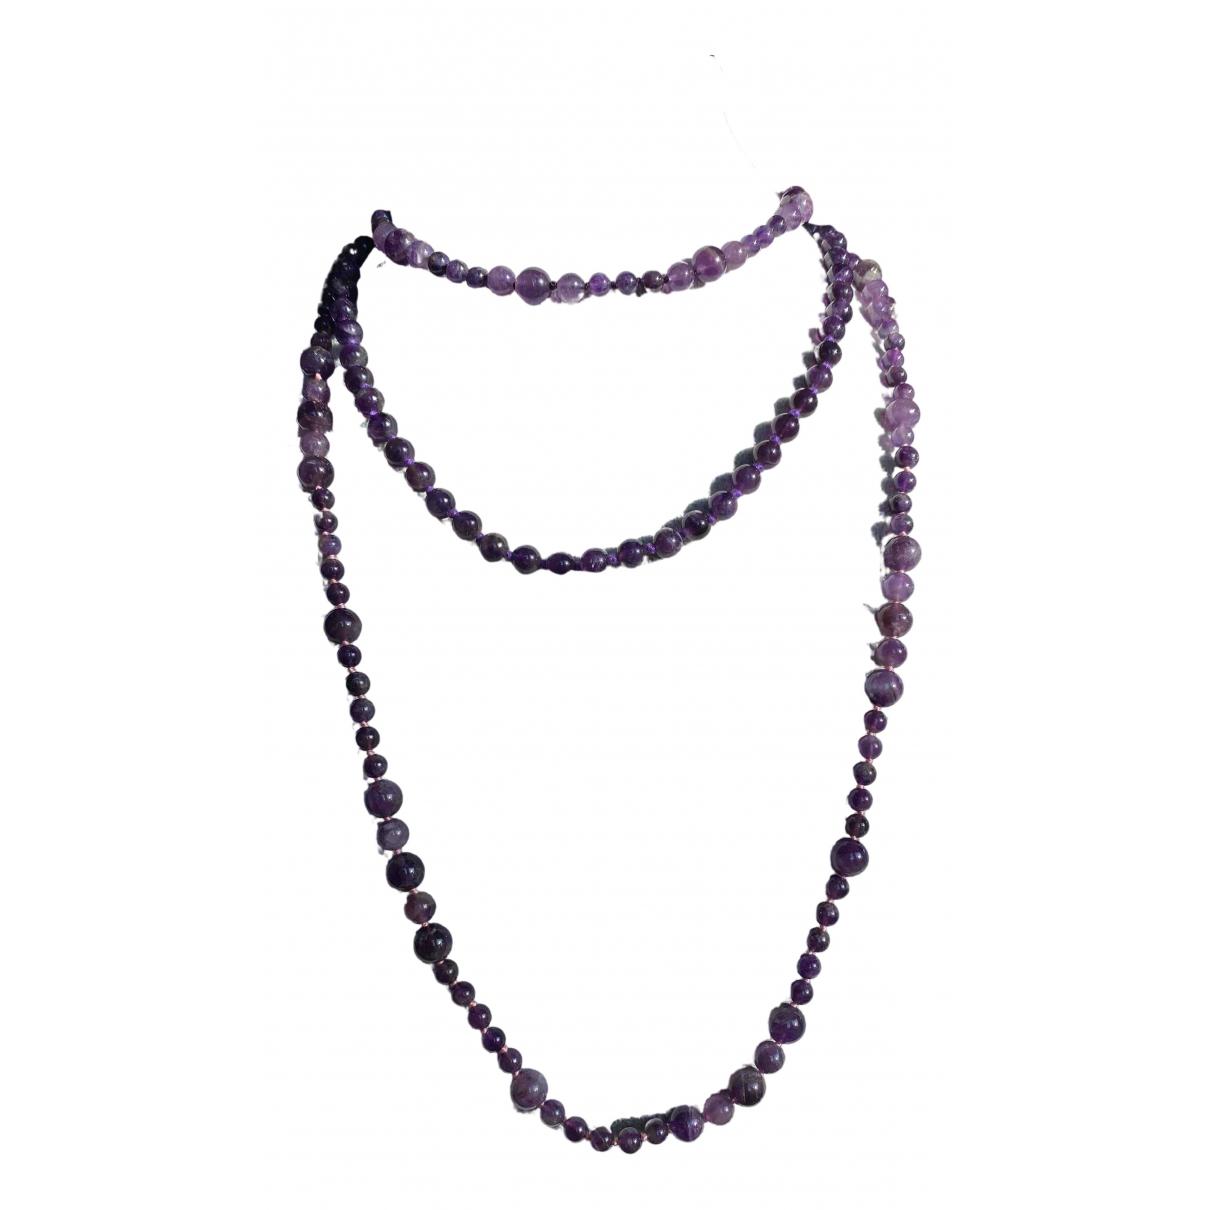 Non Signe / Unsigned Amethyste Halskette in  Lila Perlen